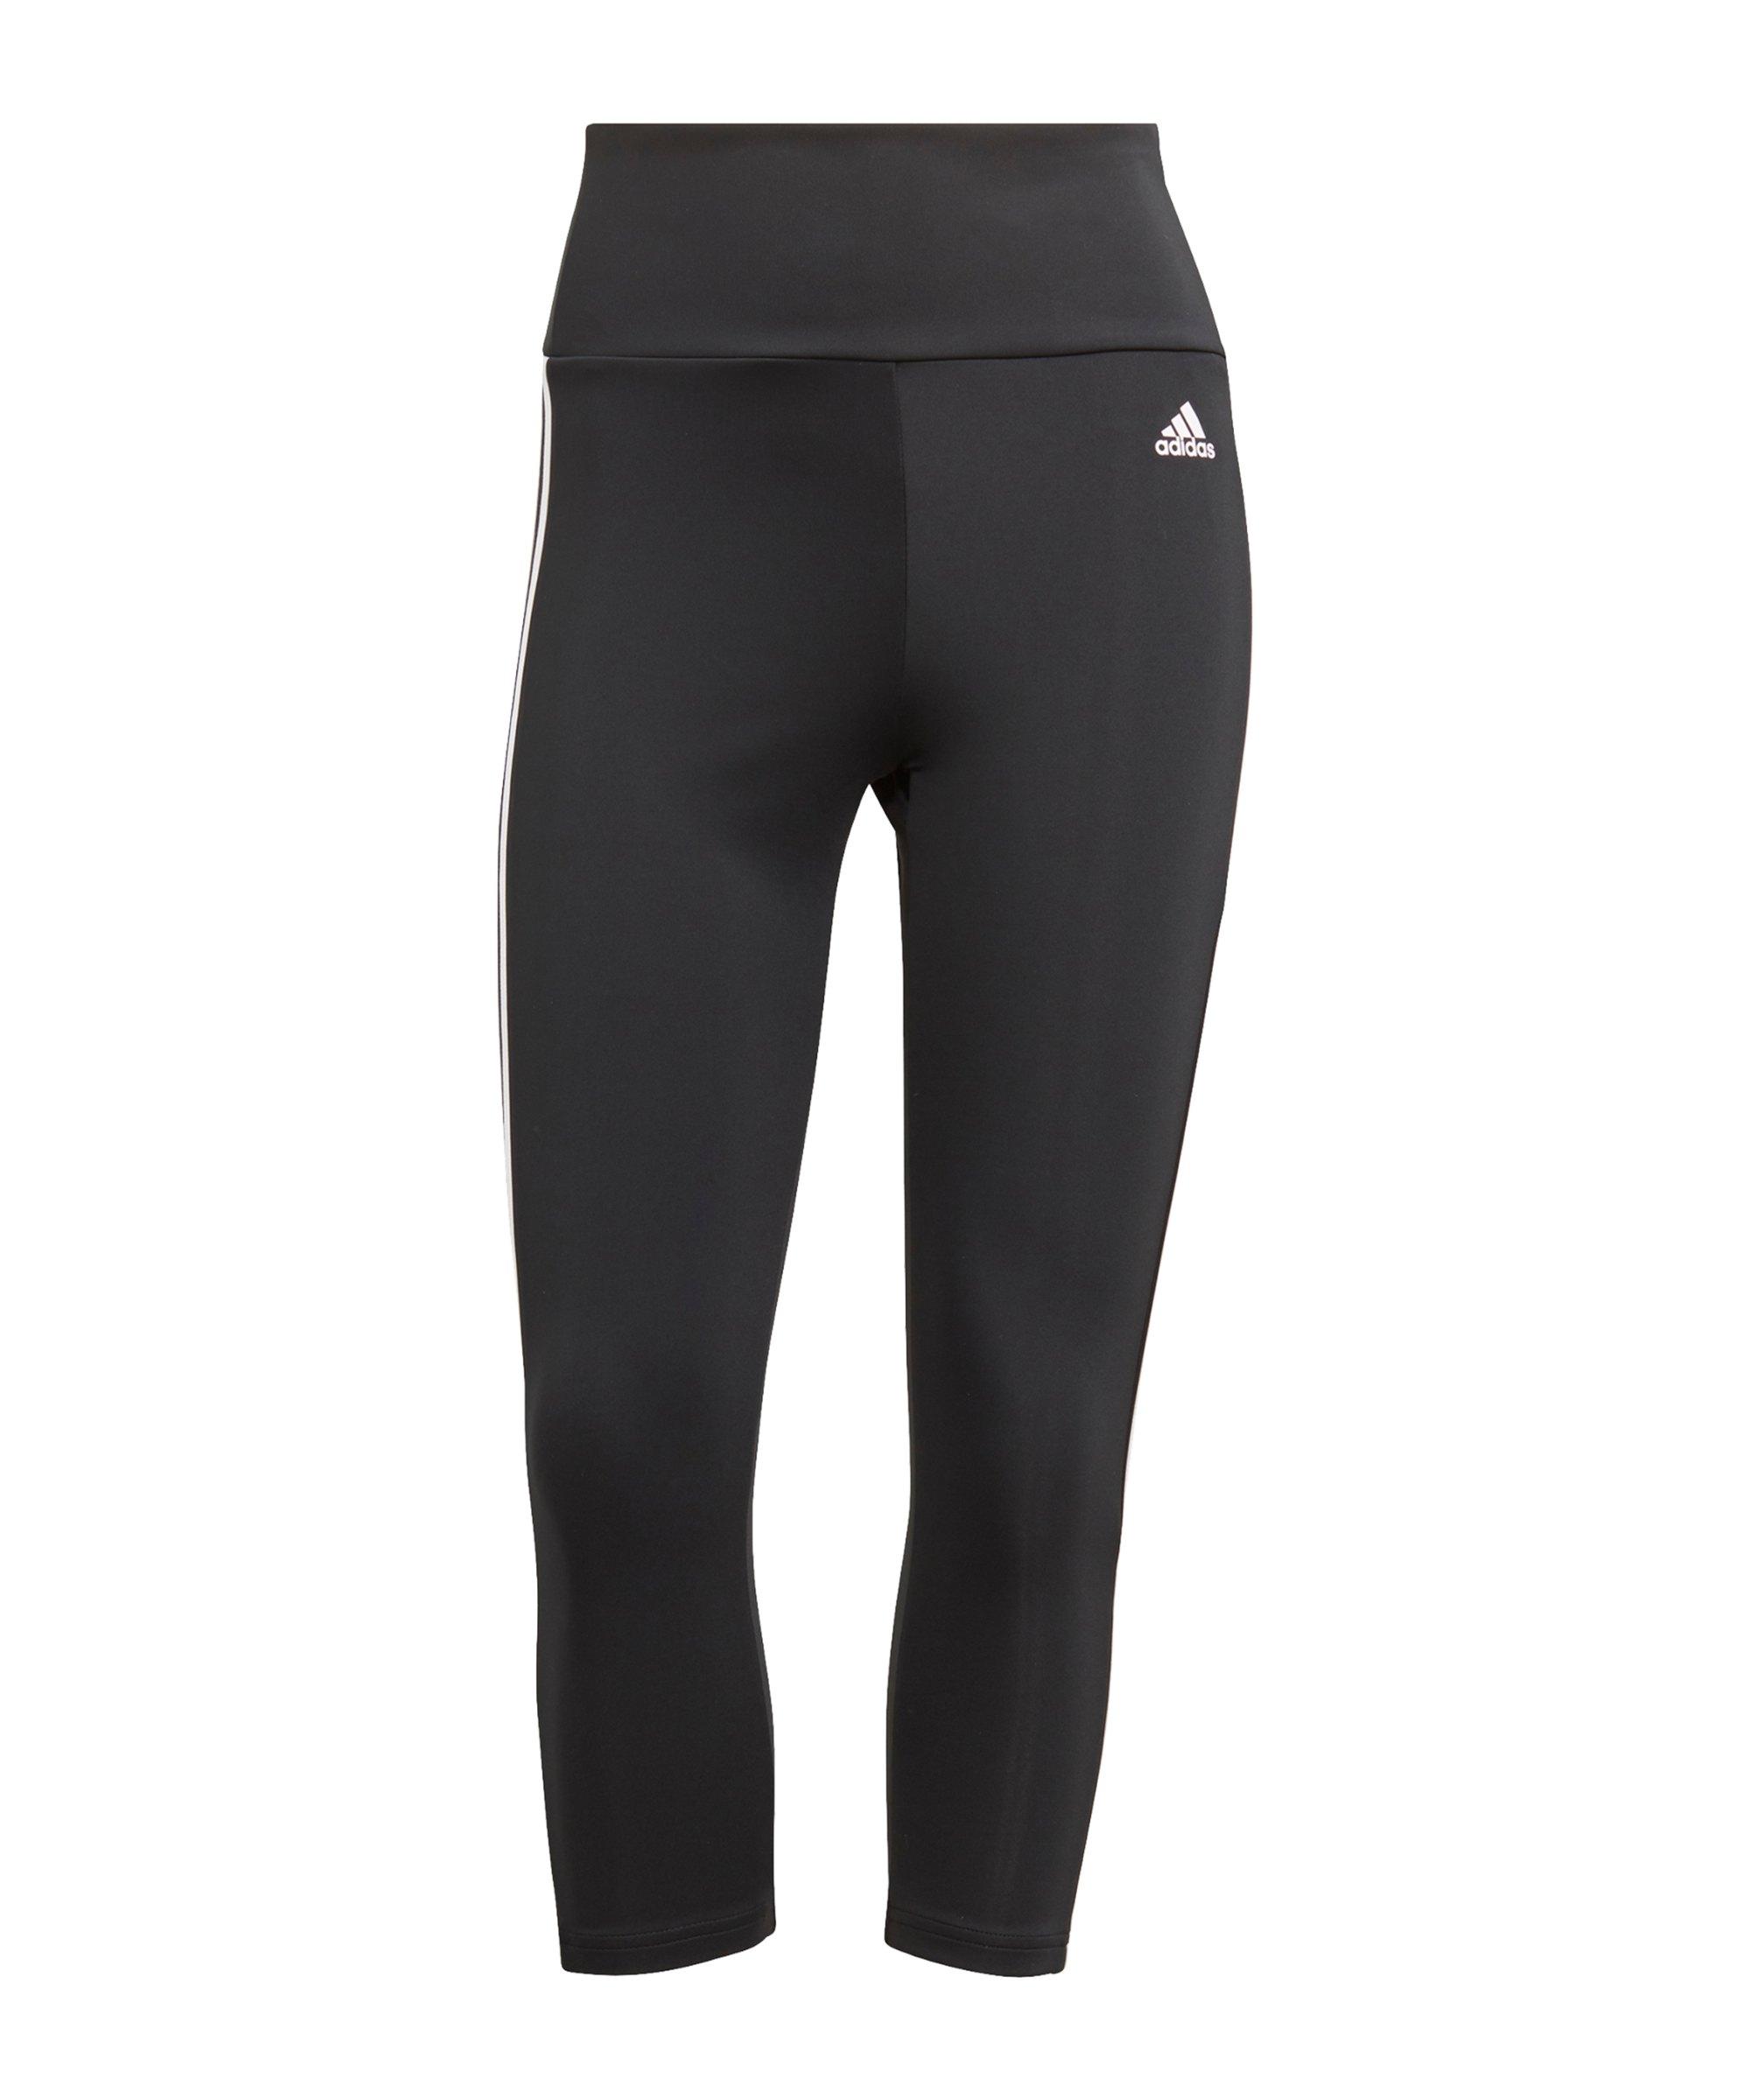 adidas 3S 3/4 Leggings Damen Running Schwarz - schwarz